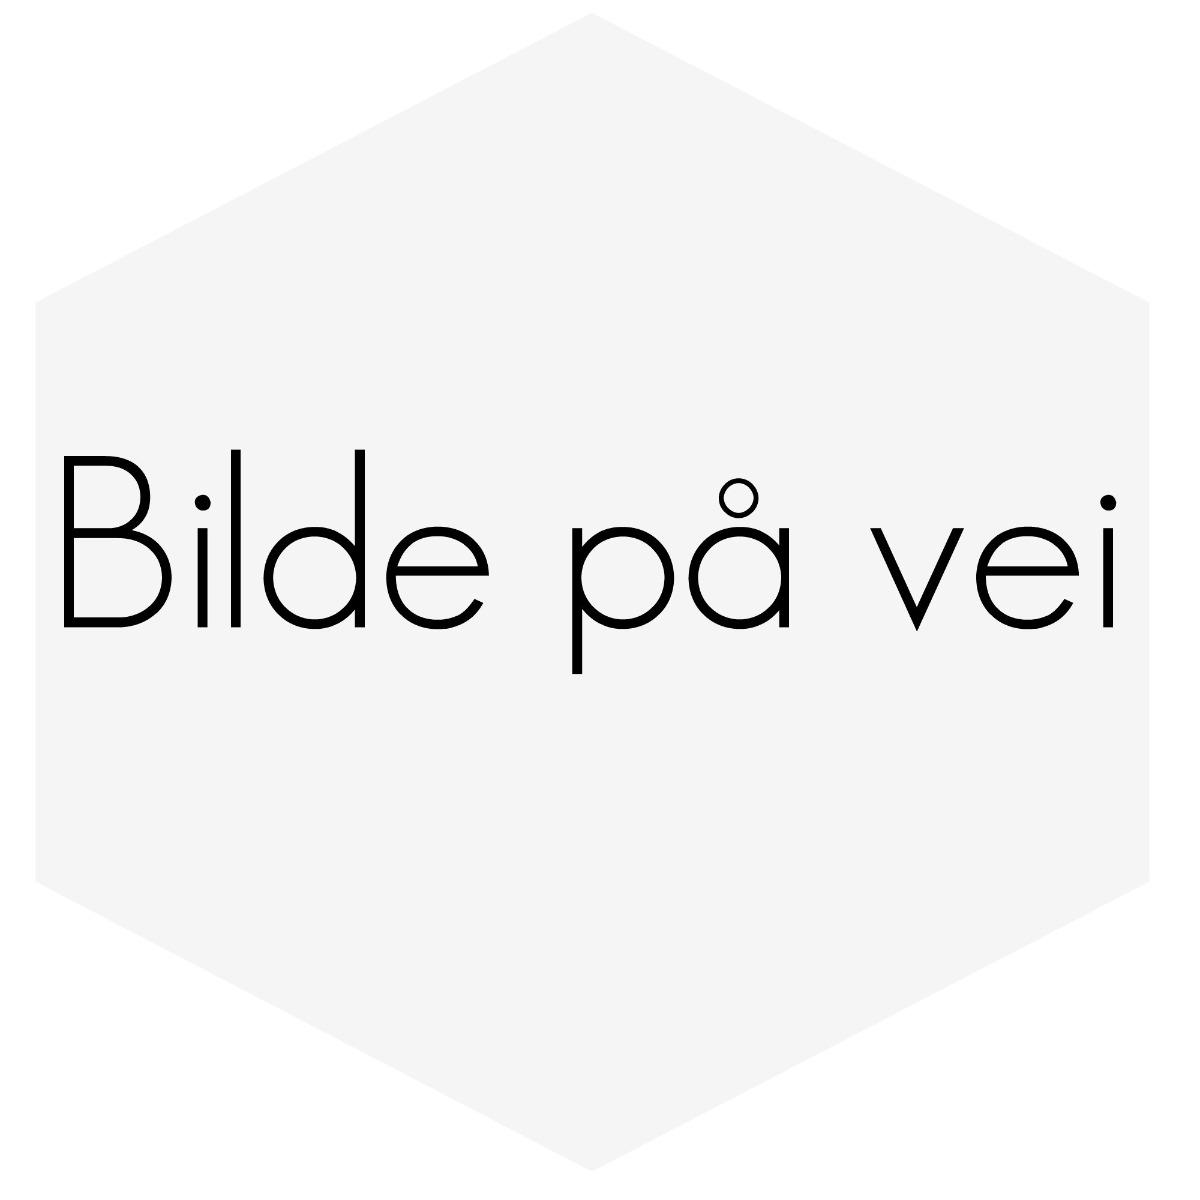 "SILIKONSLANGE RØD REDUSERING 1,25-1,75"" (32-45MM)"